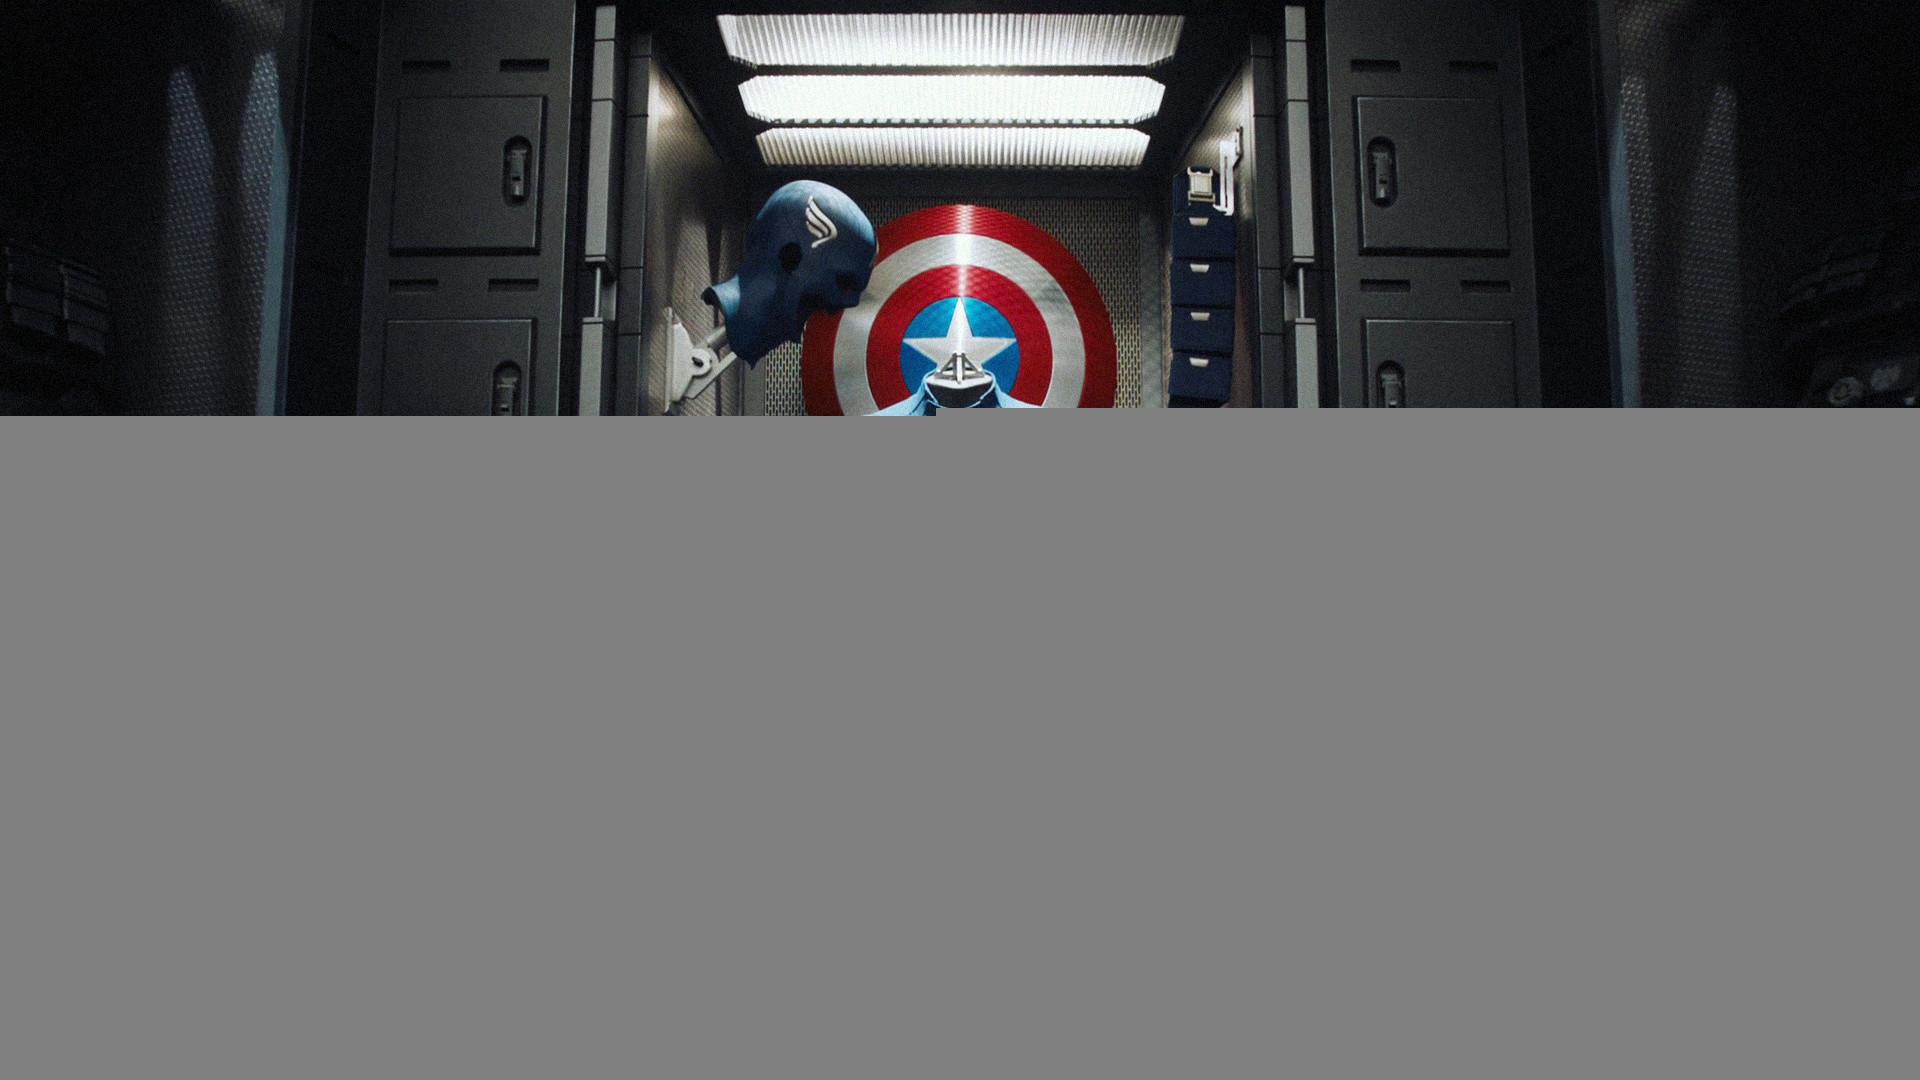 1920x1080, Avengers Captain America Suit Steve Rogers - Fondo De Pantalla Hd Full - HD Wallpaper